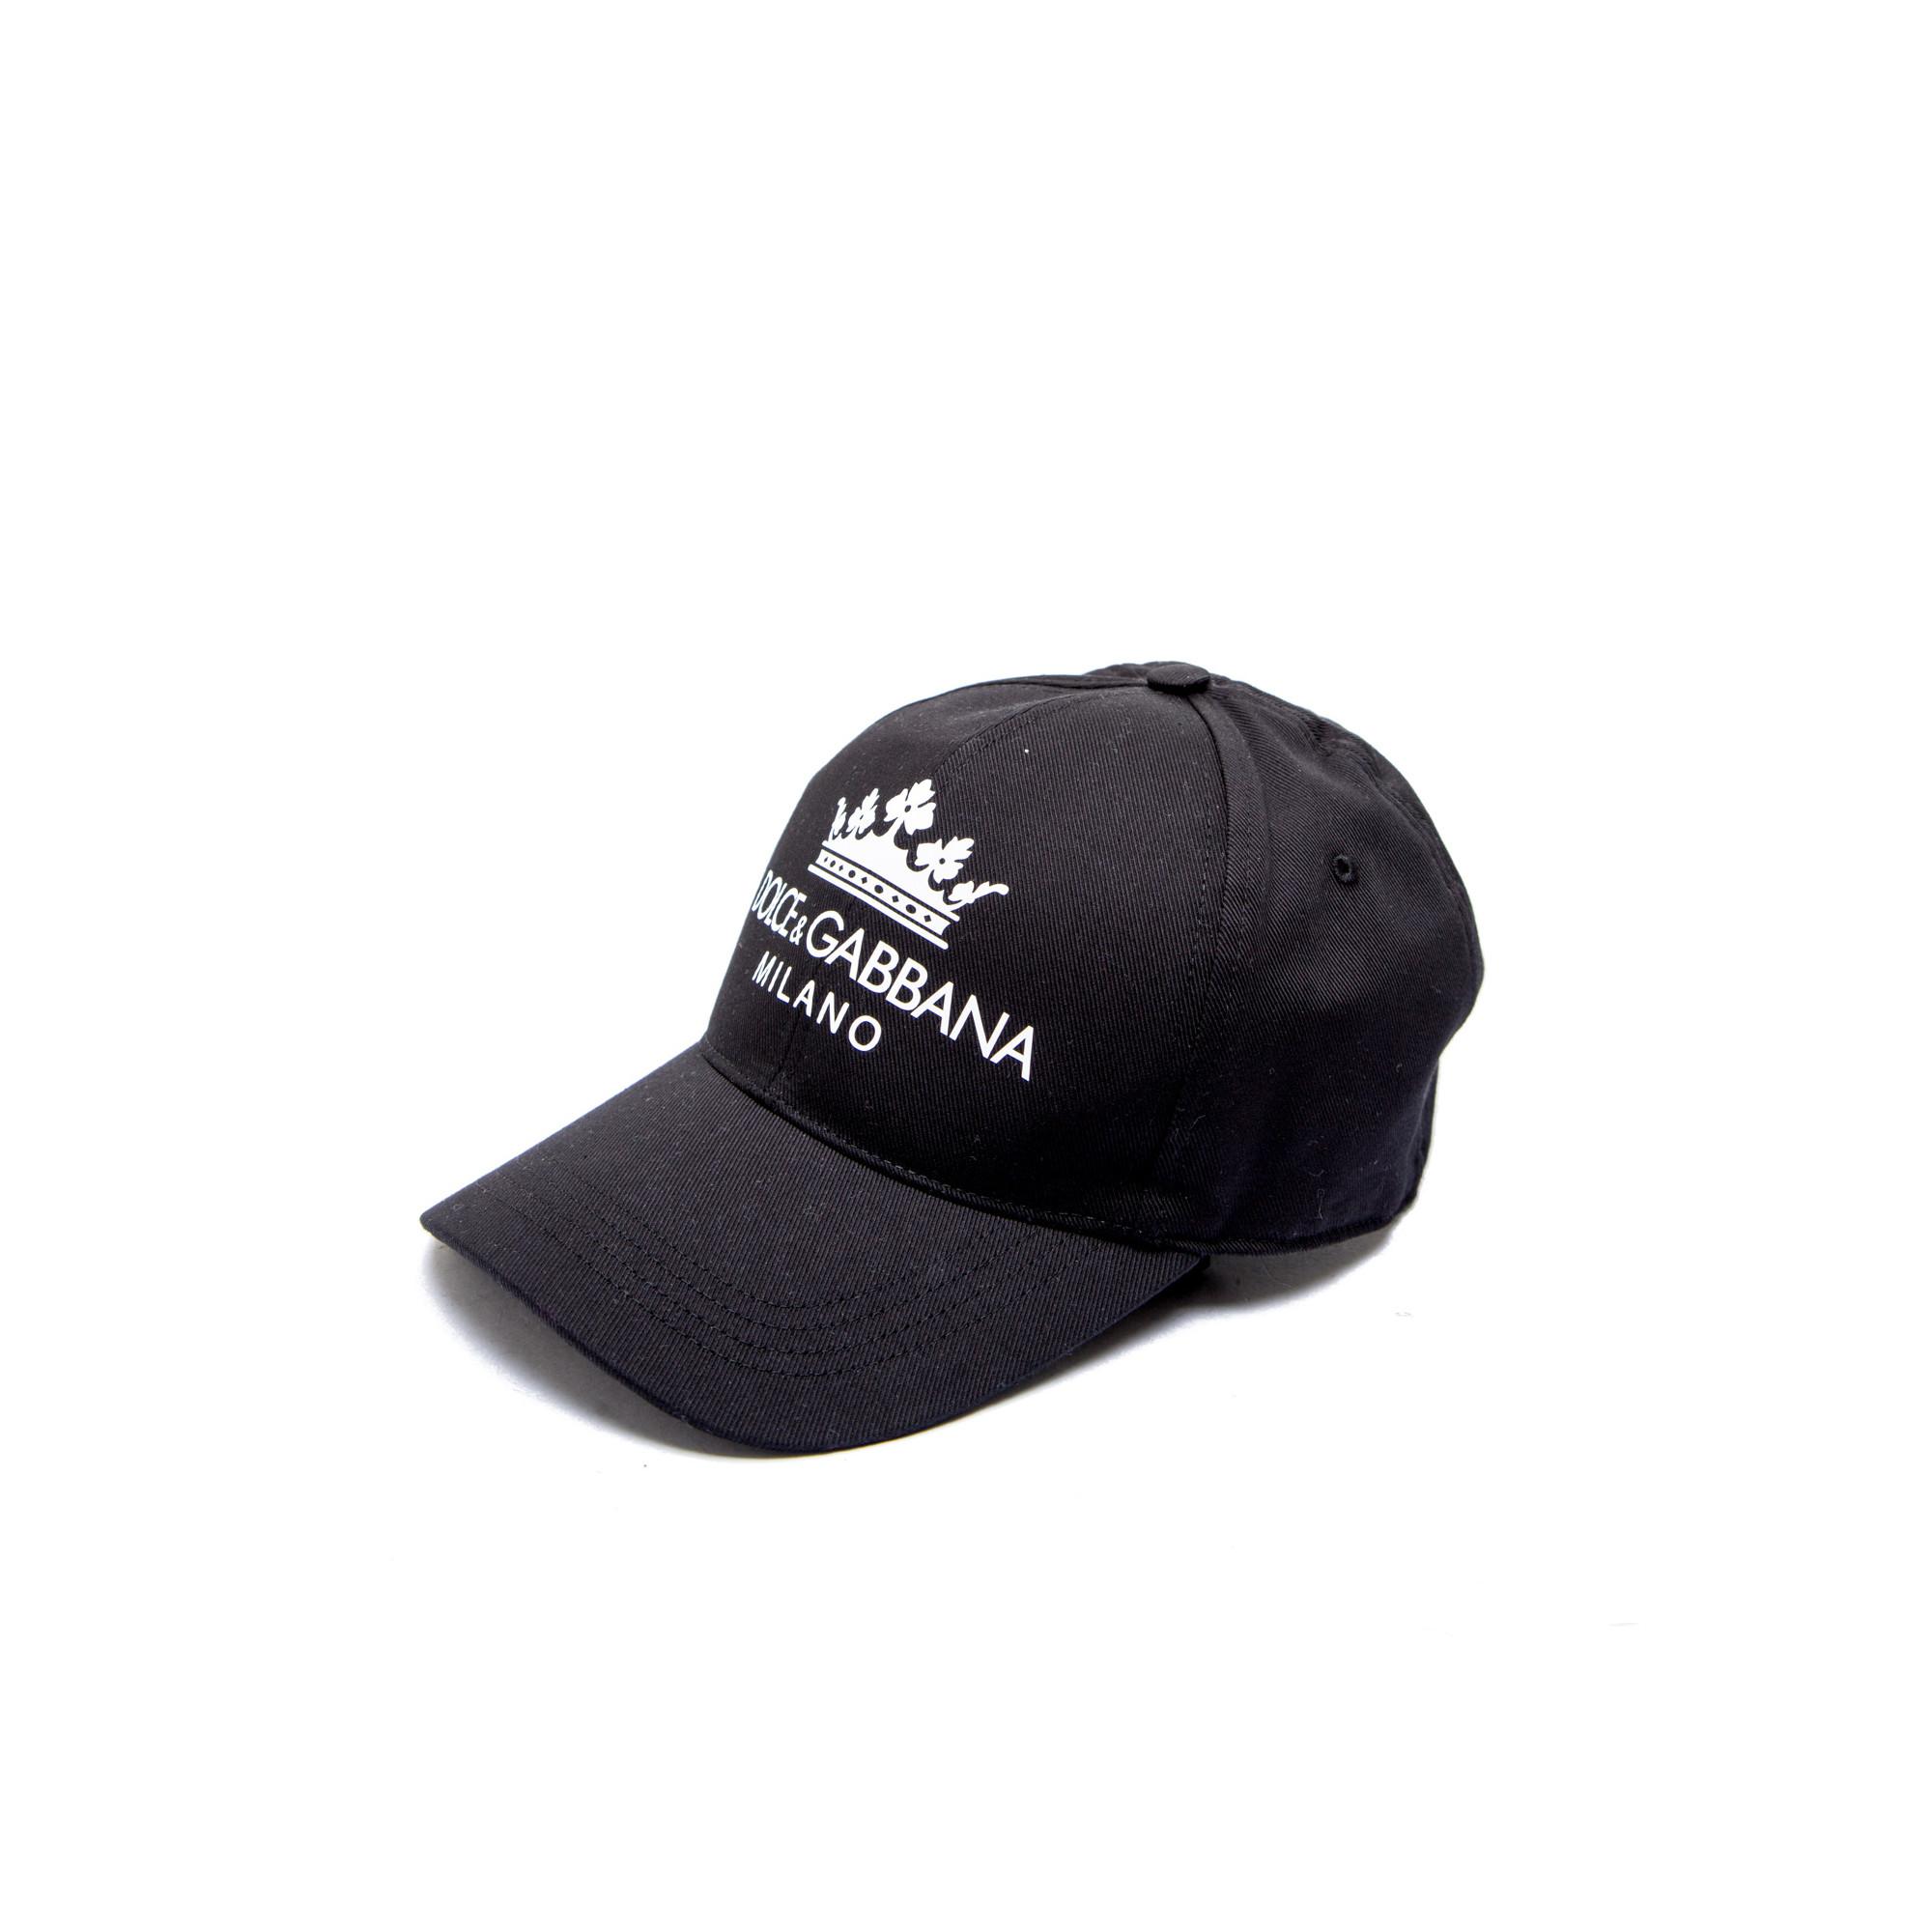 Dolce   Gabbana rapper hat black Dolce   Gabbana rapper hat black -  www.derodeloper ... ef789db9b3f